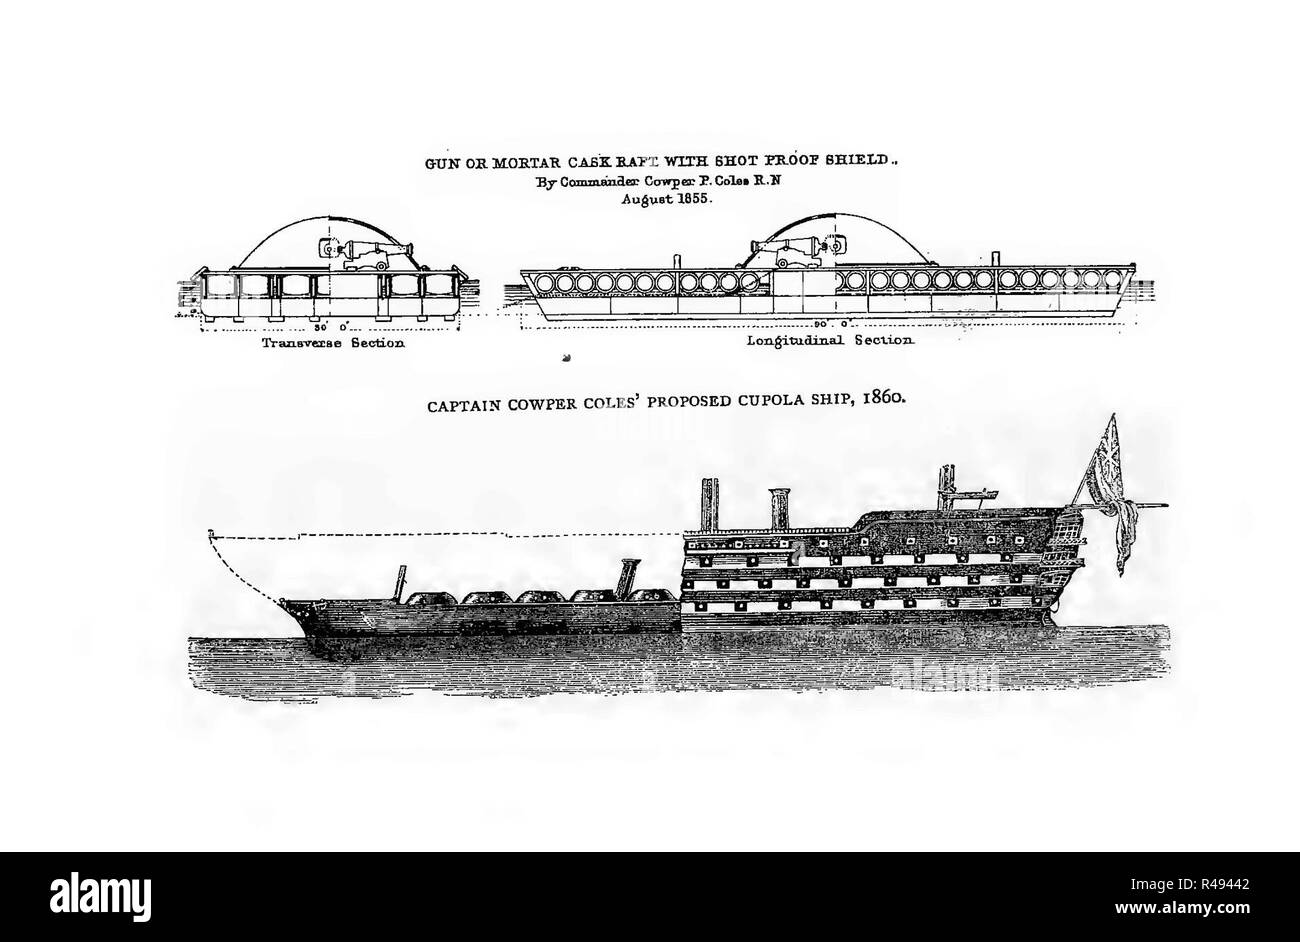 Captain Cowper Coles' proposed cupola ship, 1860. - Stock Image